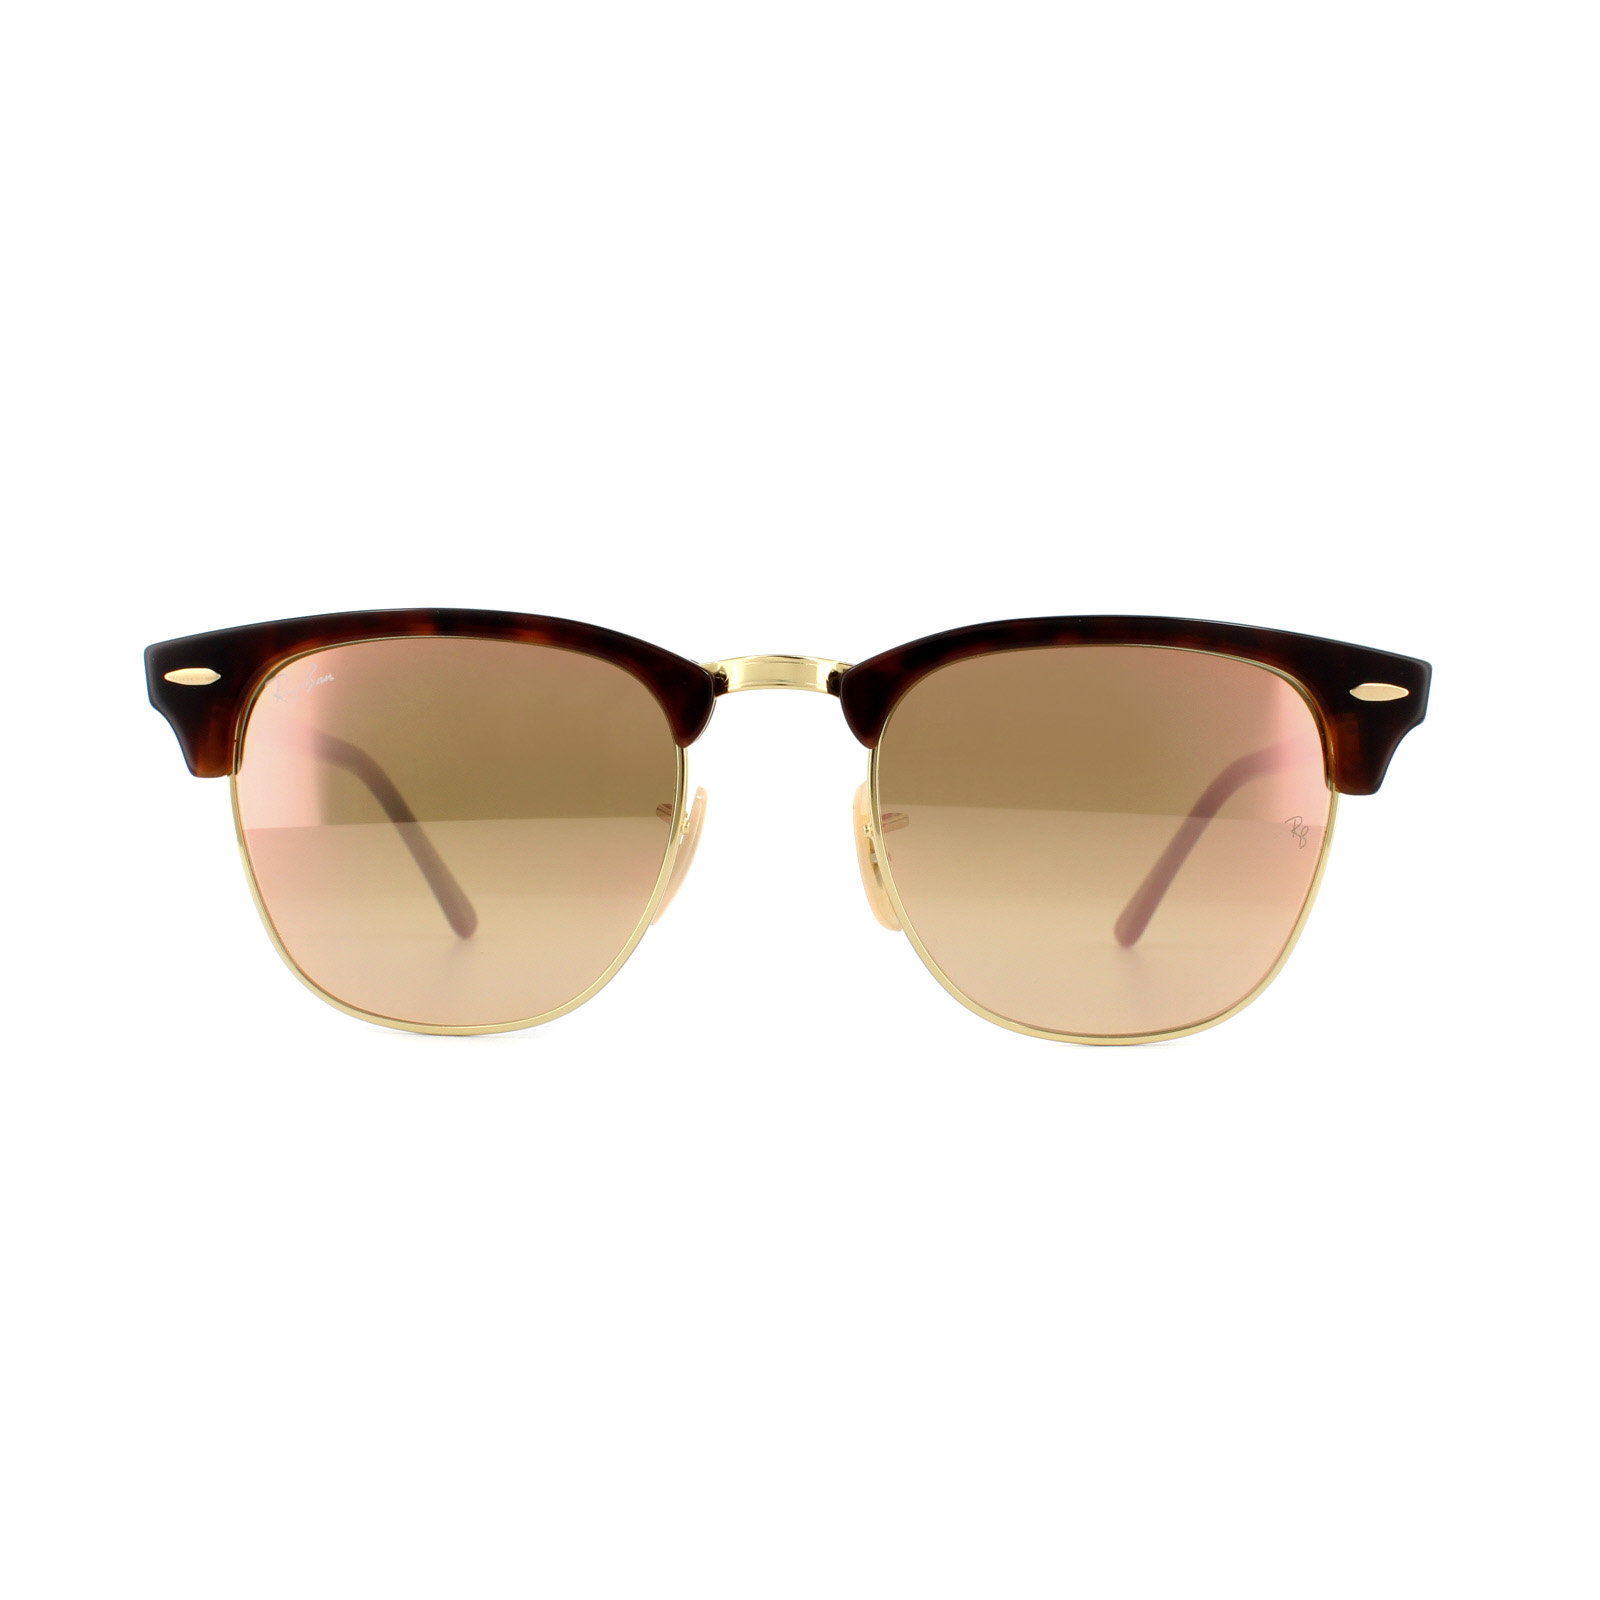 13f6d75ea0 Cheap Ray-Ban Clubmaster 3016 Sunglasses - Discounted Sunglasses